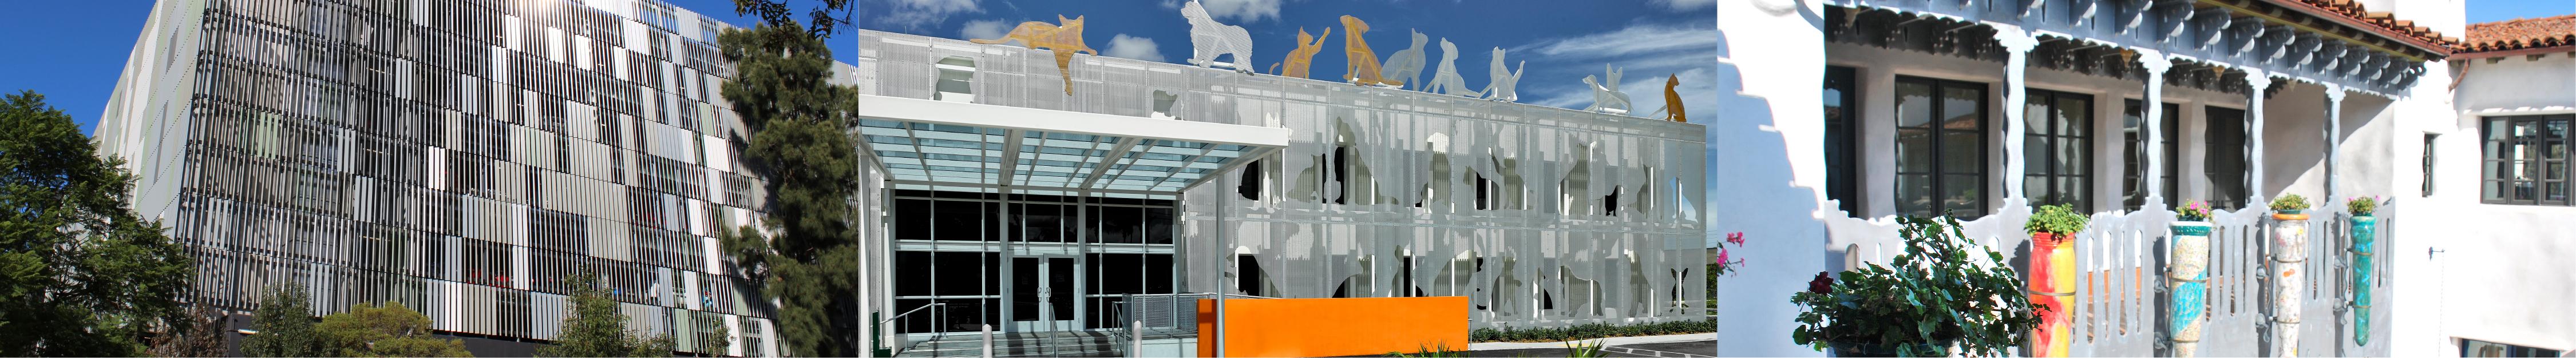 Galvanized Building & Architecture